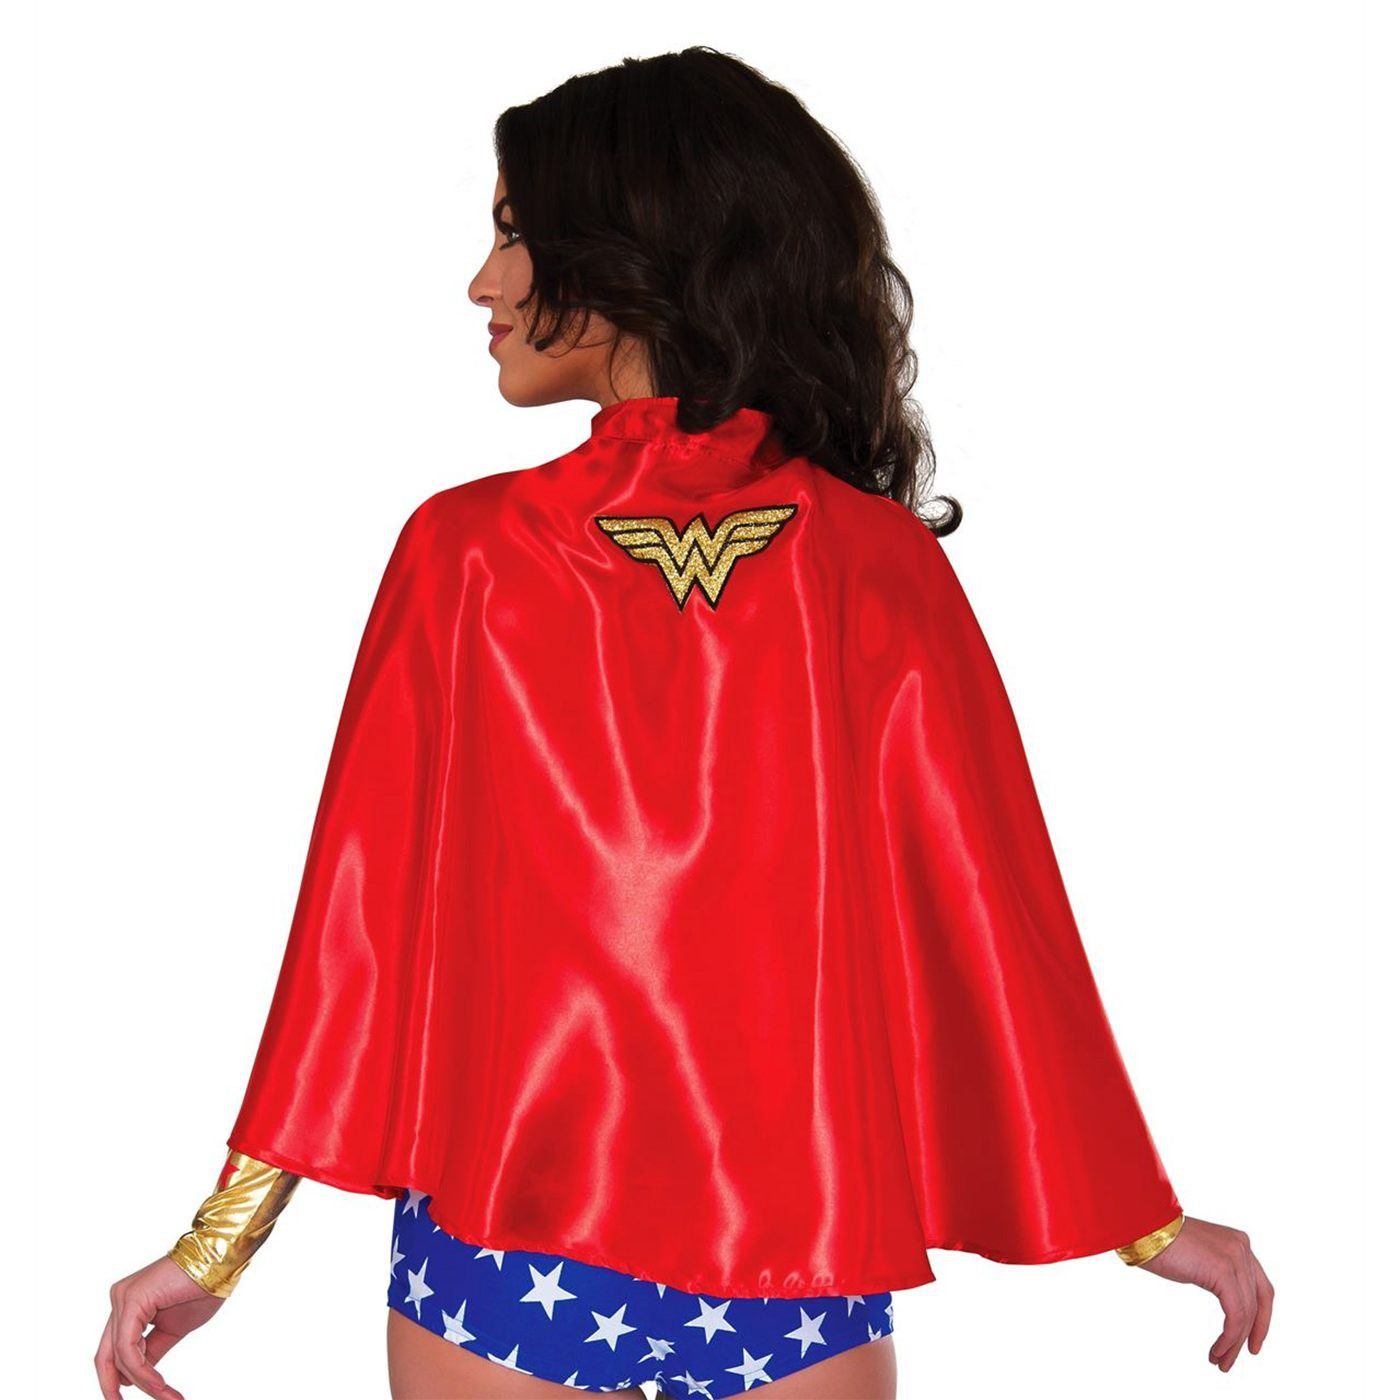 Wonder Woman Symbol Cape